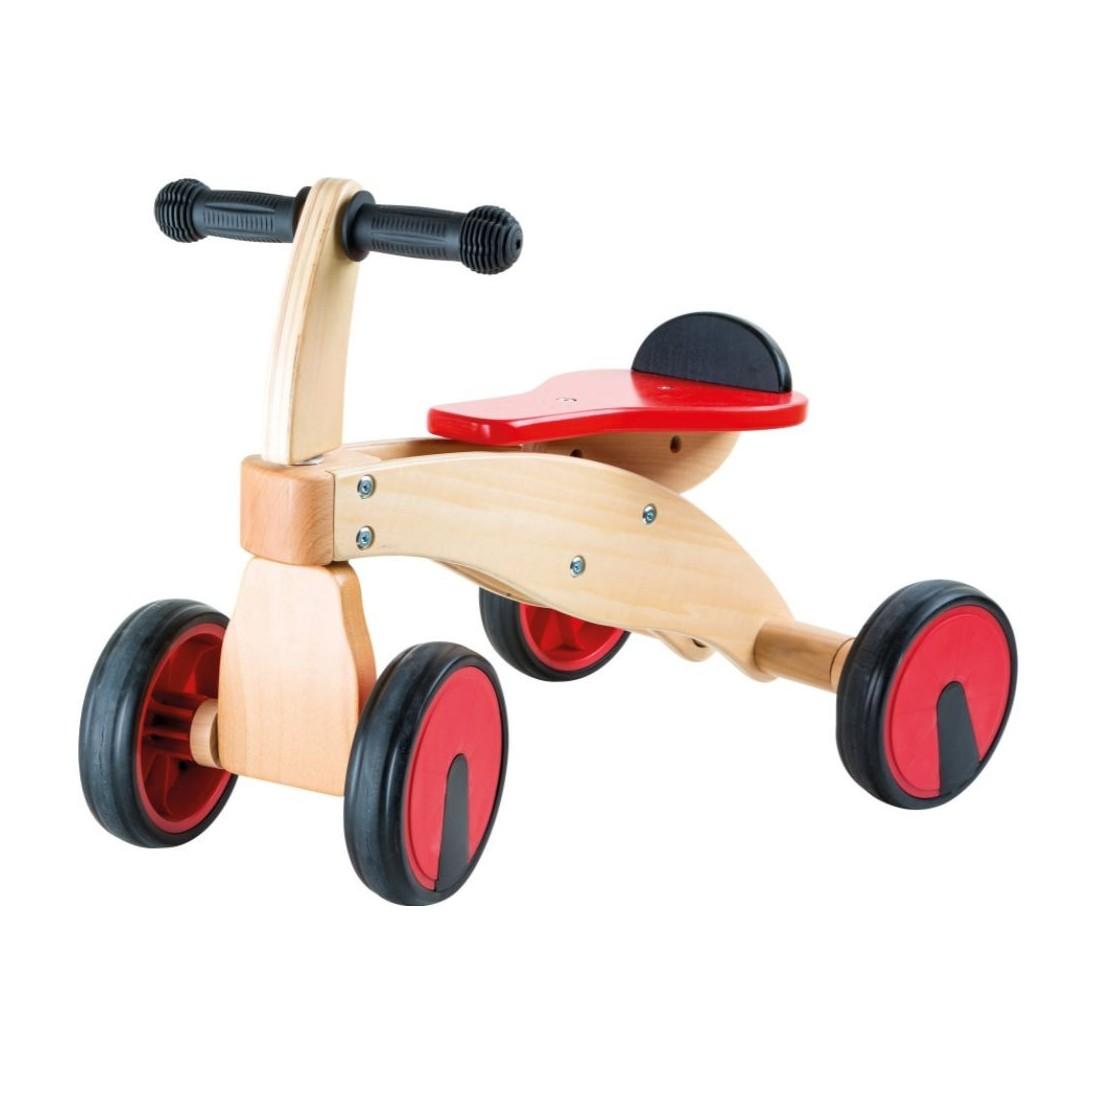 Bolide 3 roues rouge en bois